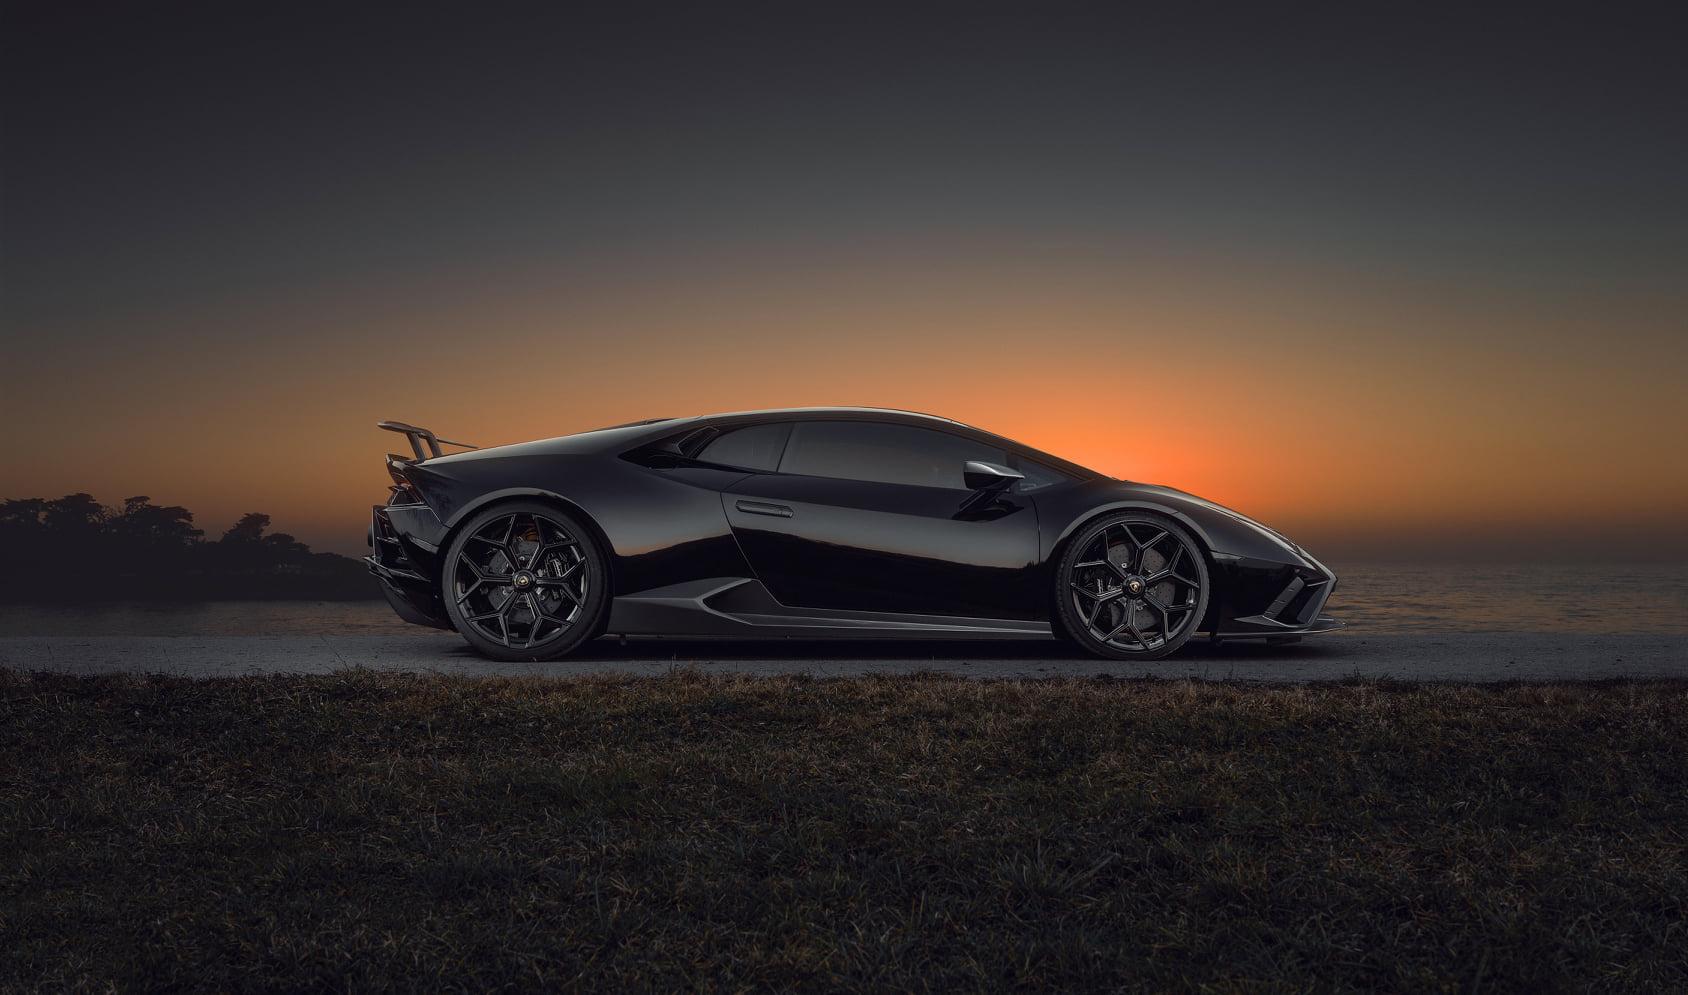 Lamborghini-Huracan-Evo-RWD-by-Novitec-7